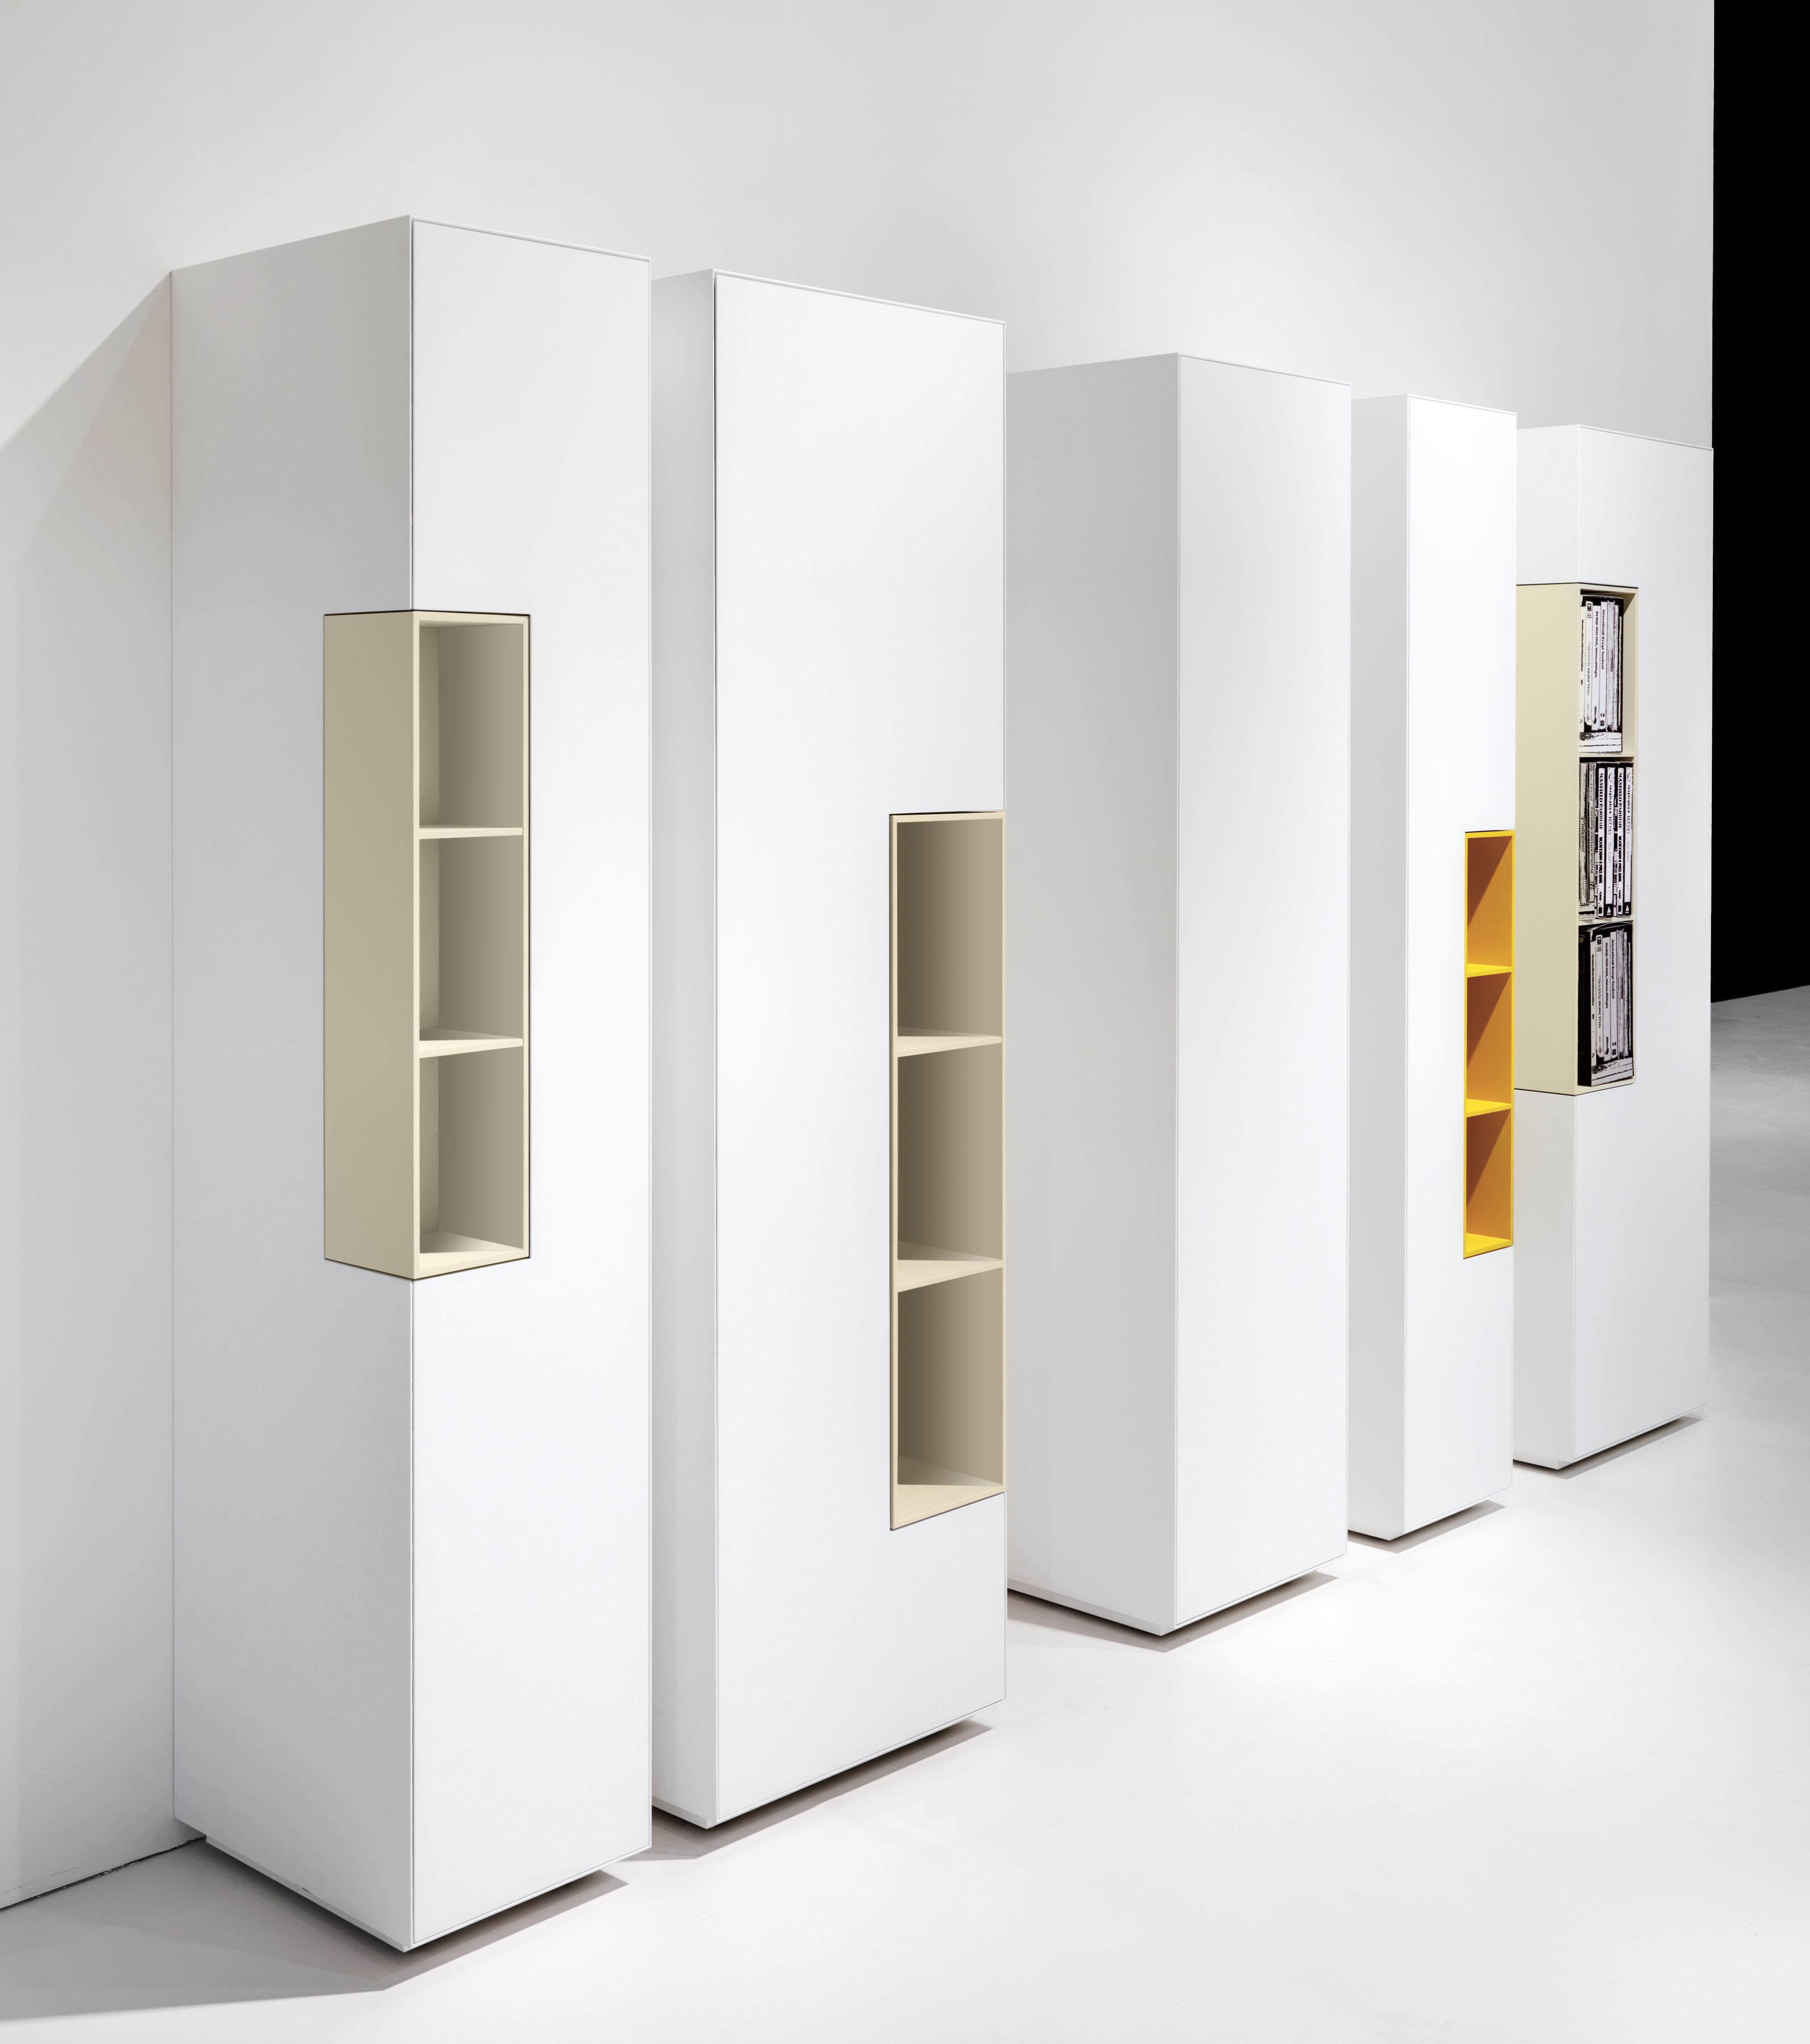 rangement inmotion colonne 3 tag res h 188 x l 45 cm h 188 x l 45 cm blanc mat mdf italia. Black Bedroom Furniture Sets. Home Design Ideas